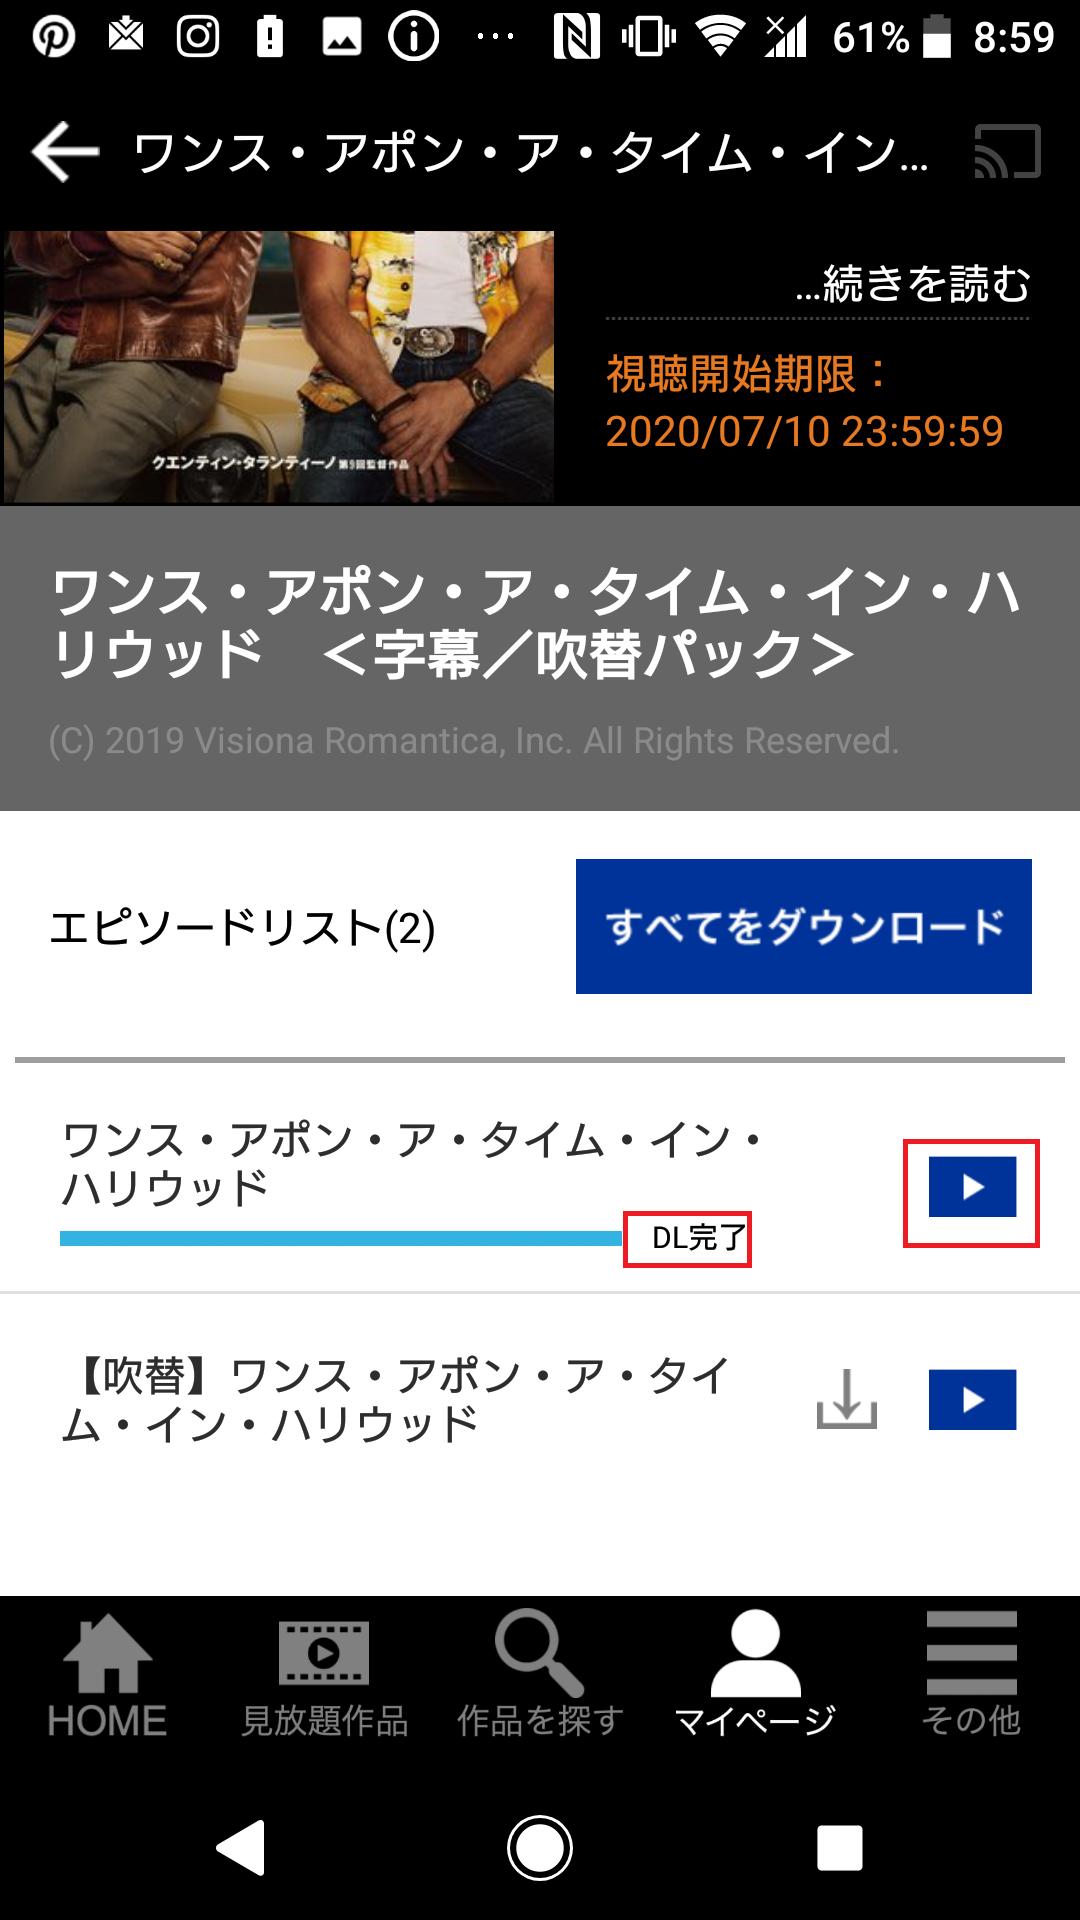 TSUTAYA TV(ツタヤティービー)の動画ダウンロード、オフライン視聴方法の手順画像_8